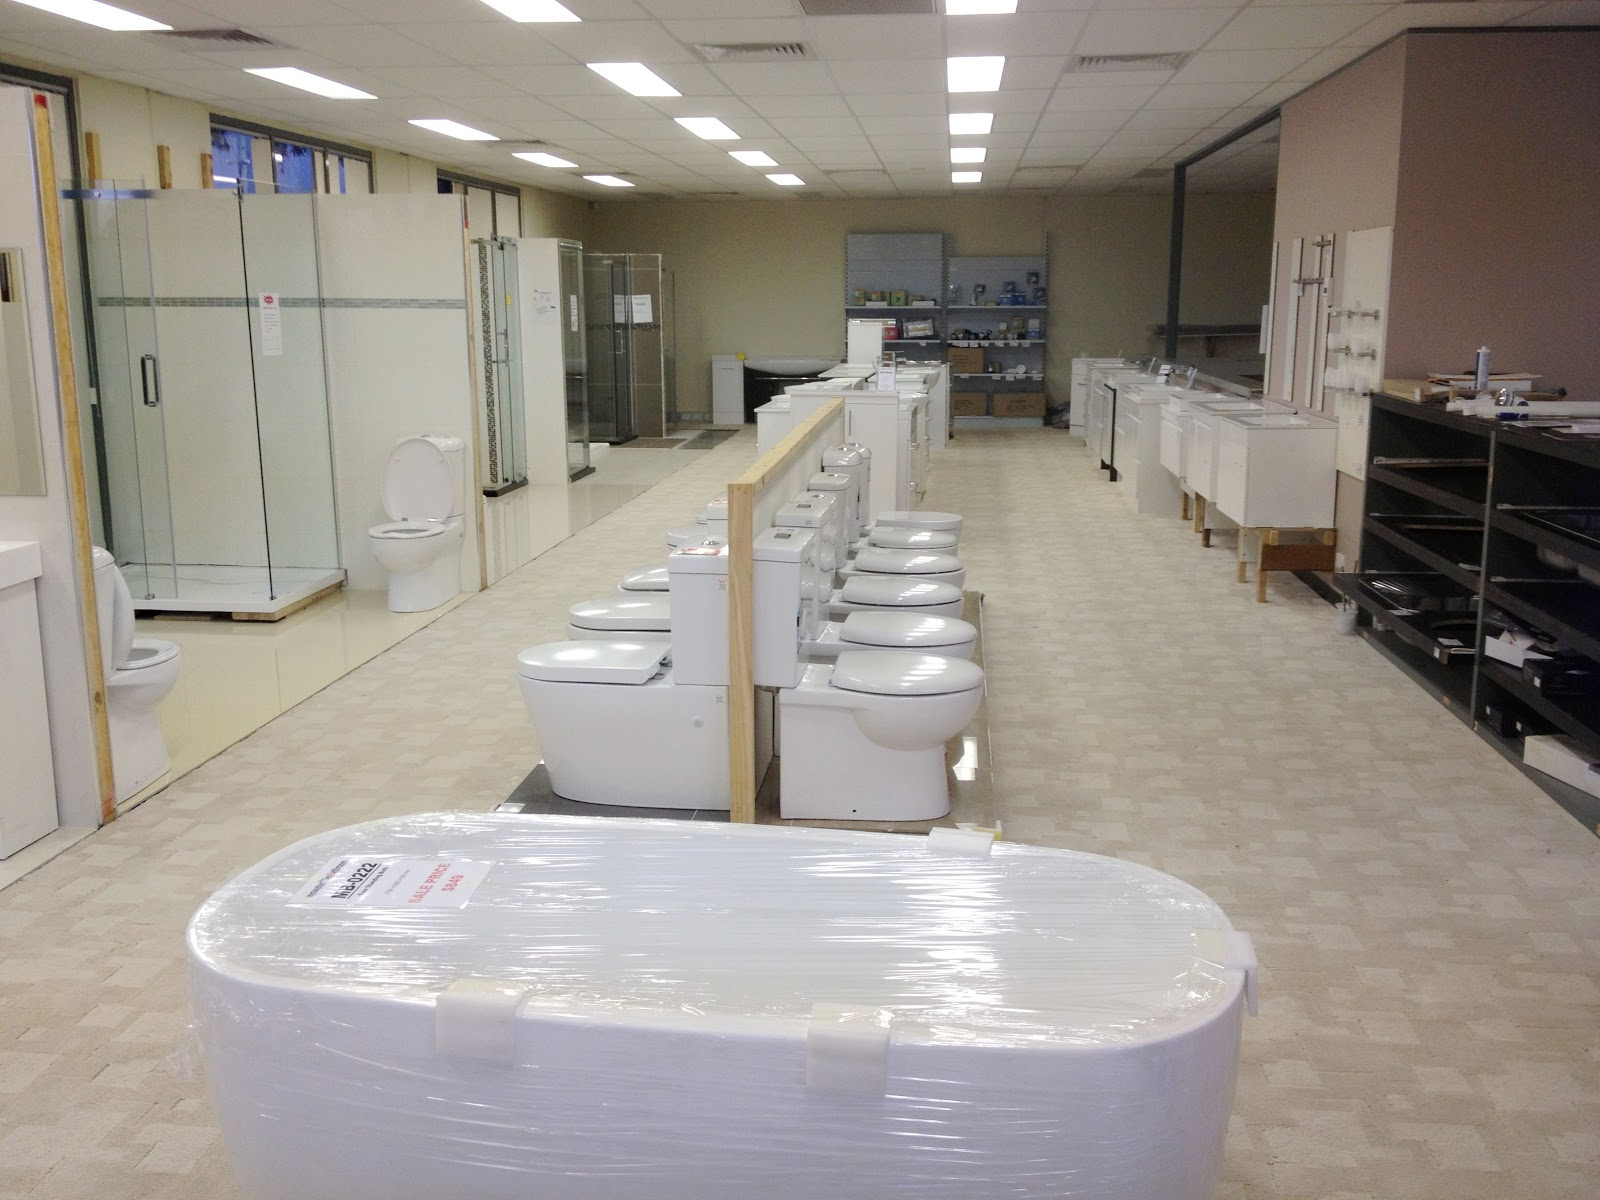 Introducing Bayswater Tile Bathroom Shop: Bayswater Tile ...